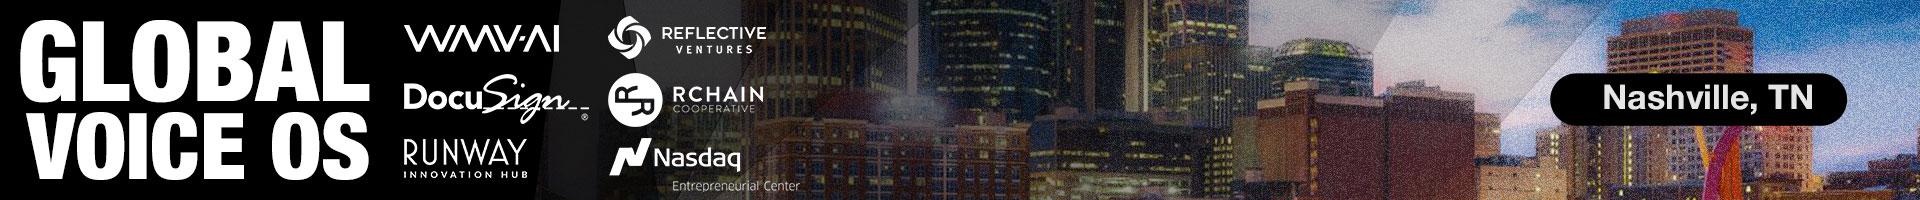 Event-Global-Voice-OS-1920x200-Nashville-TN